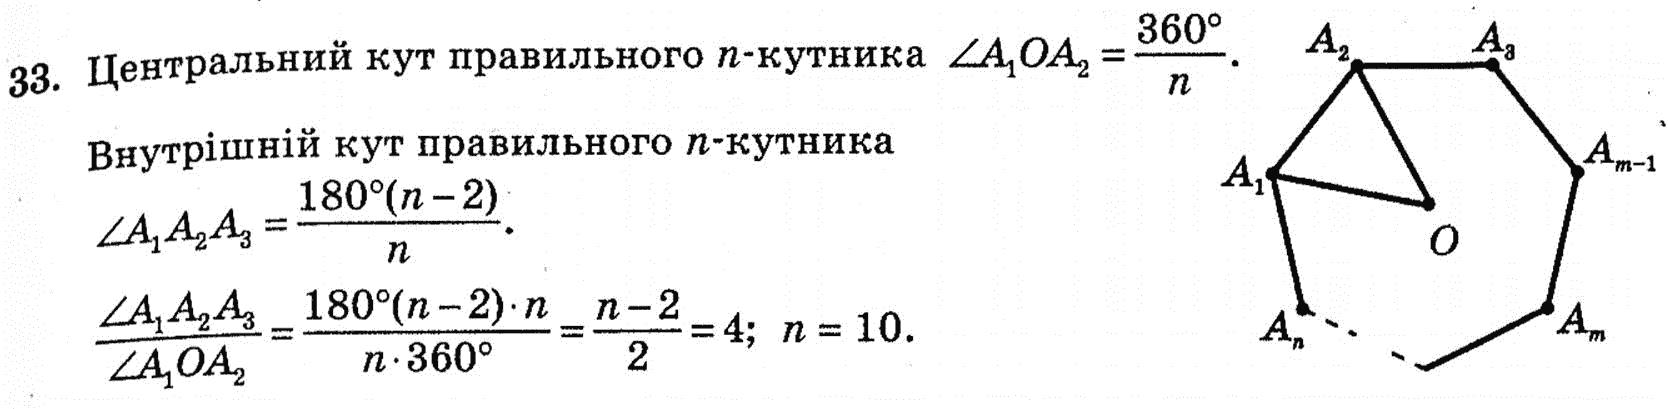 По класса 9 решебник геометрии 10